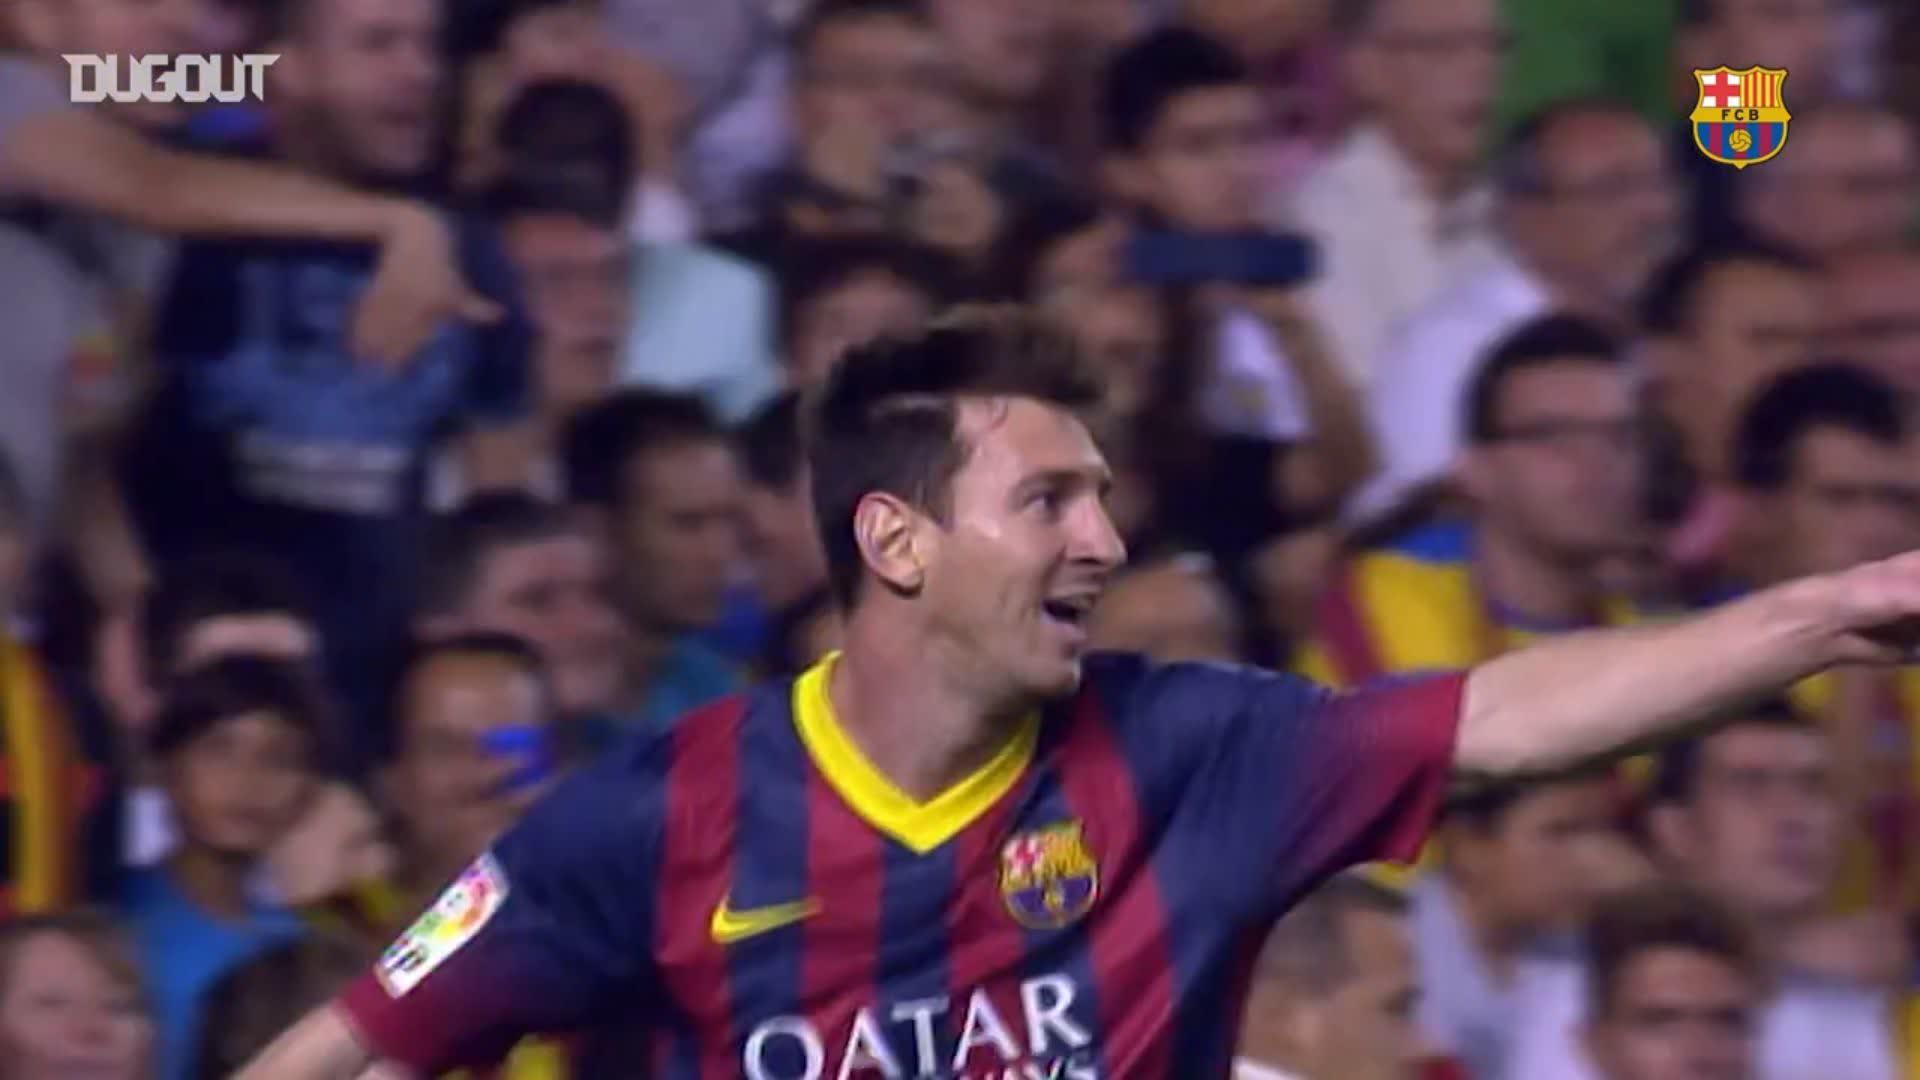 ⚽���� Goals at Mestalla, courtesy of @Dugout  ��! ��Watch more goals �� https://t.co/5CrXdzZxuT https://t.co/I11gxM6mNC